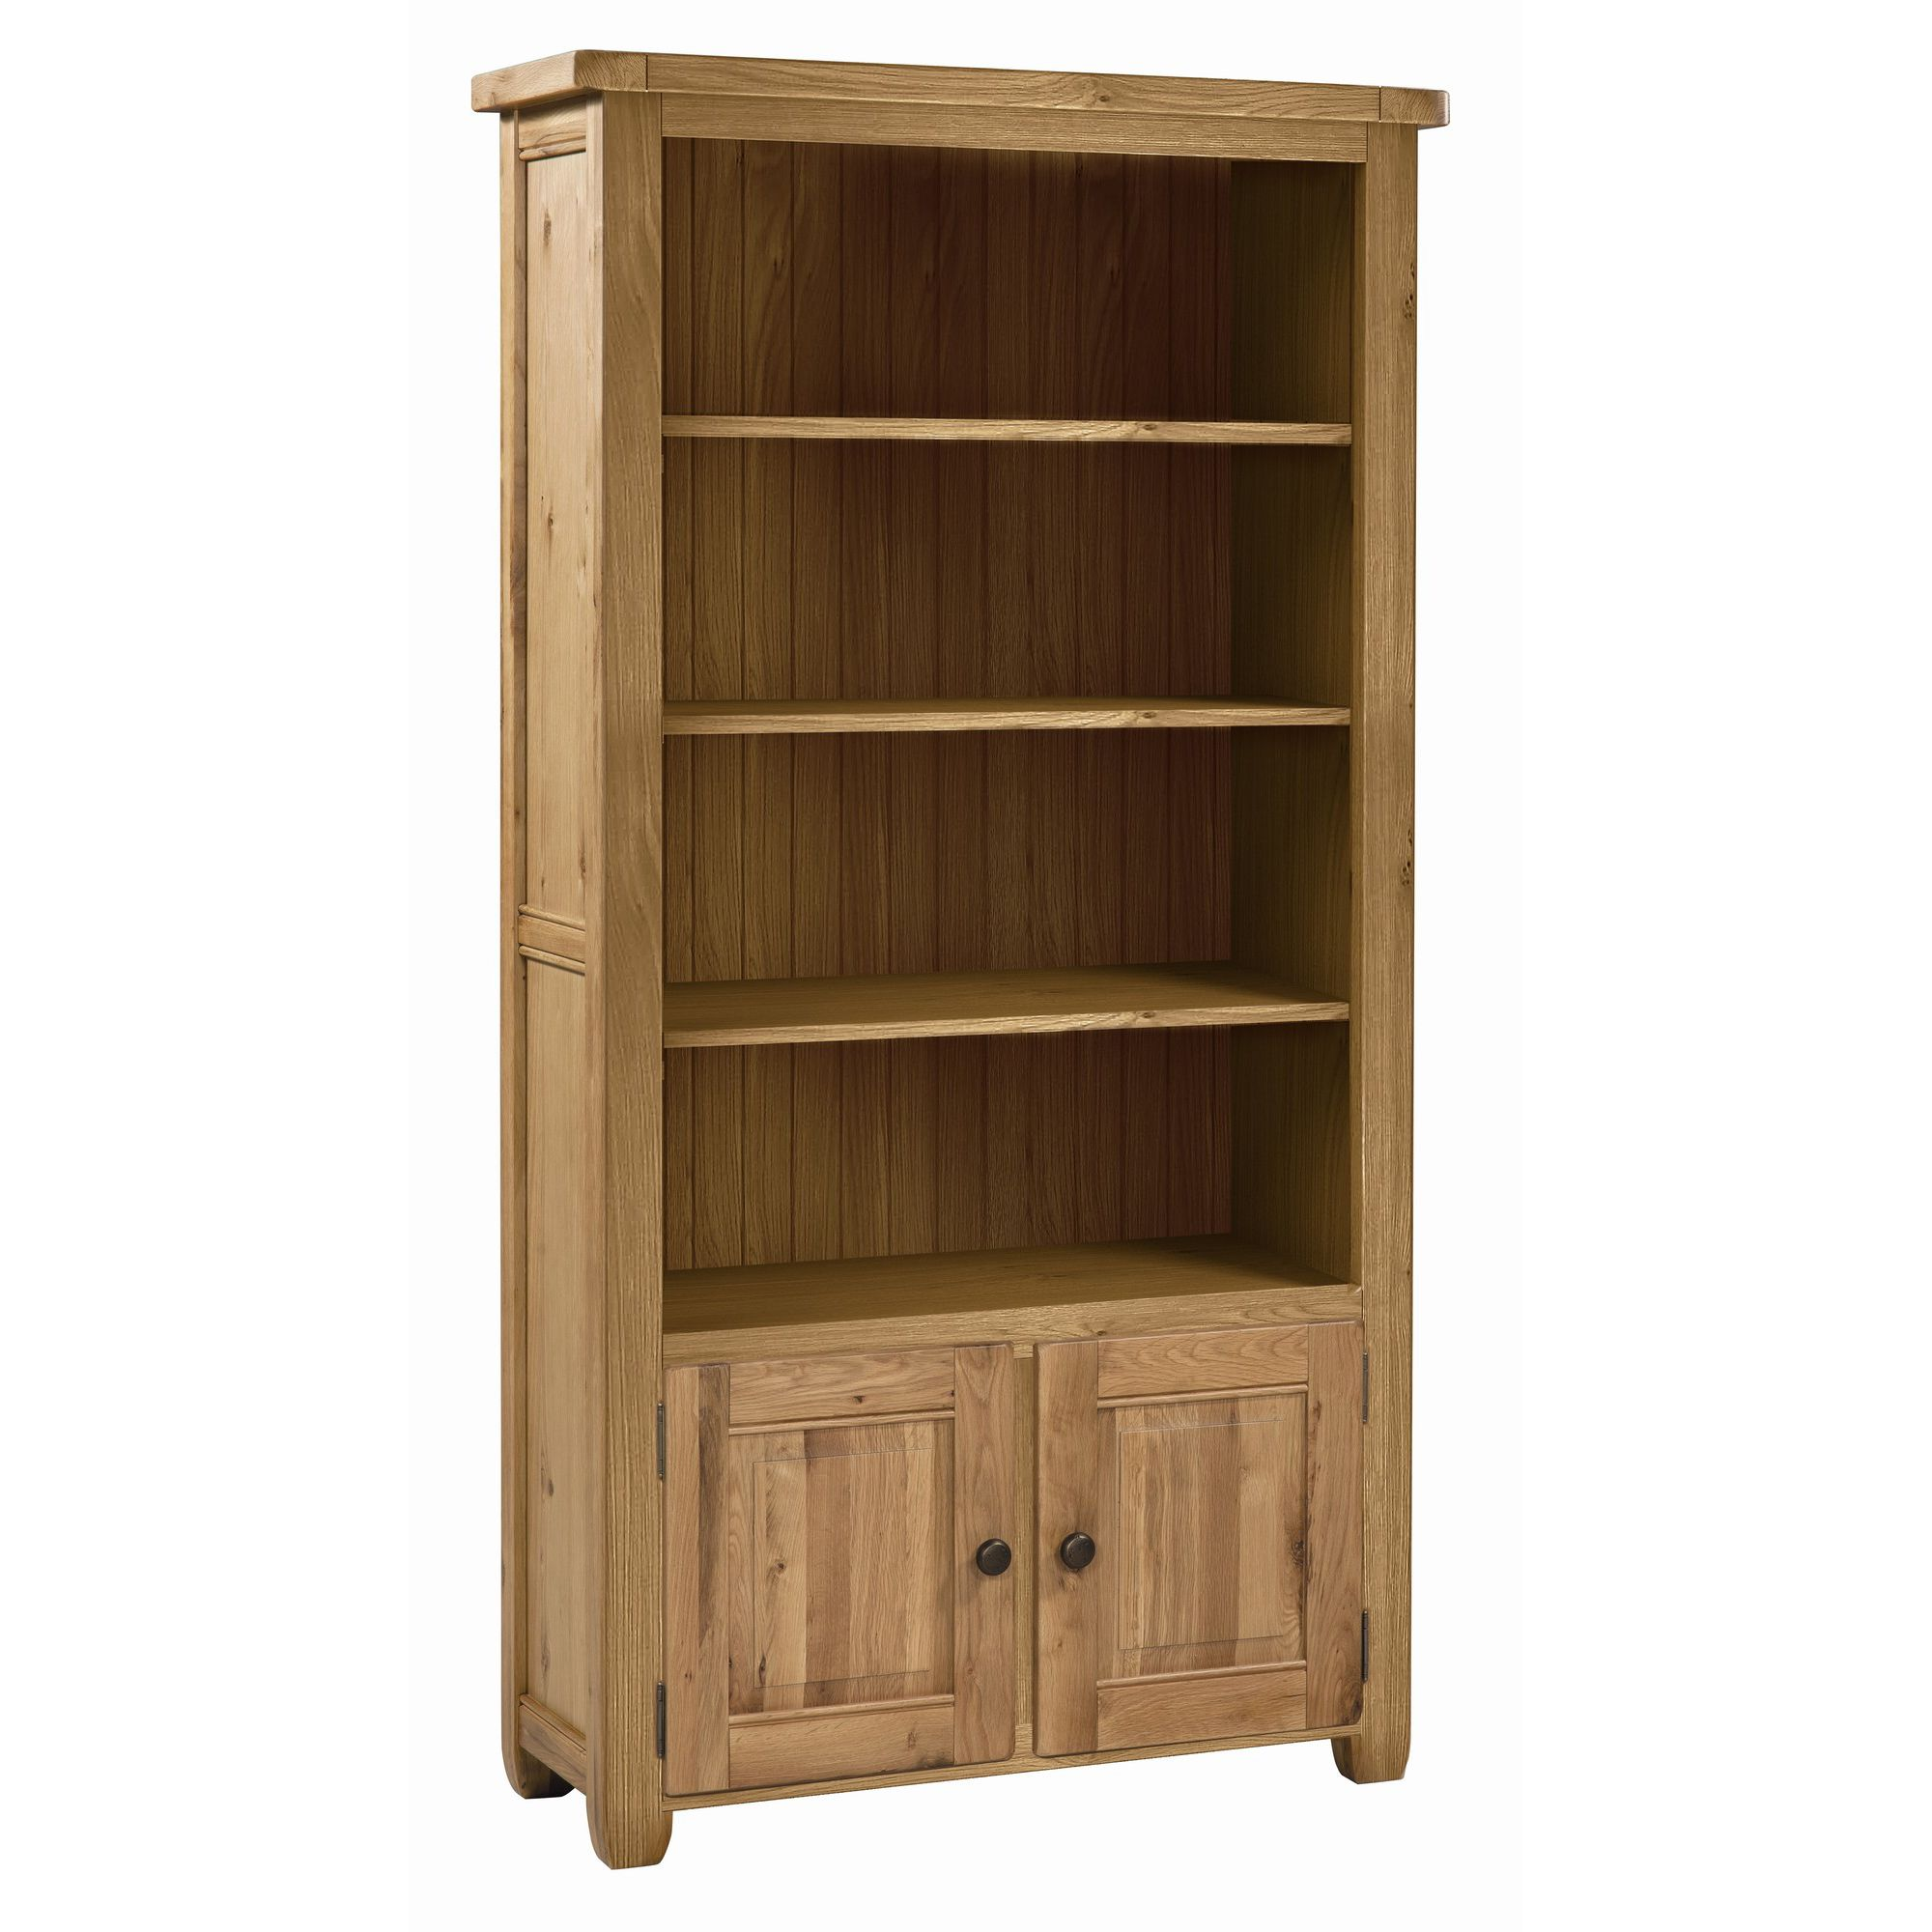 Alterton Furniture Cherry Creek Oak Large Bookcase at Tesco Direct